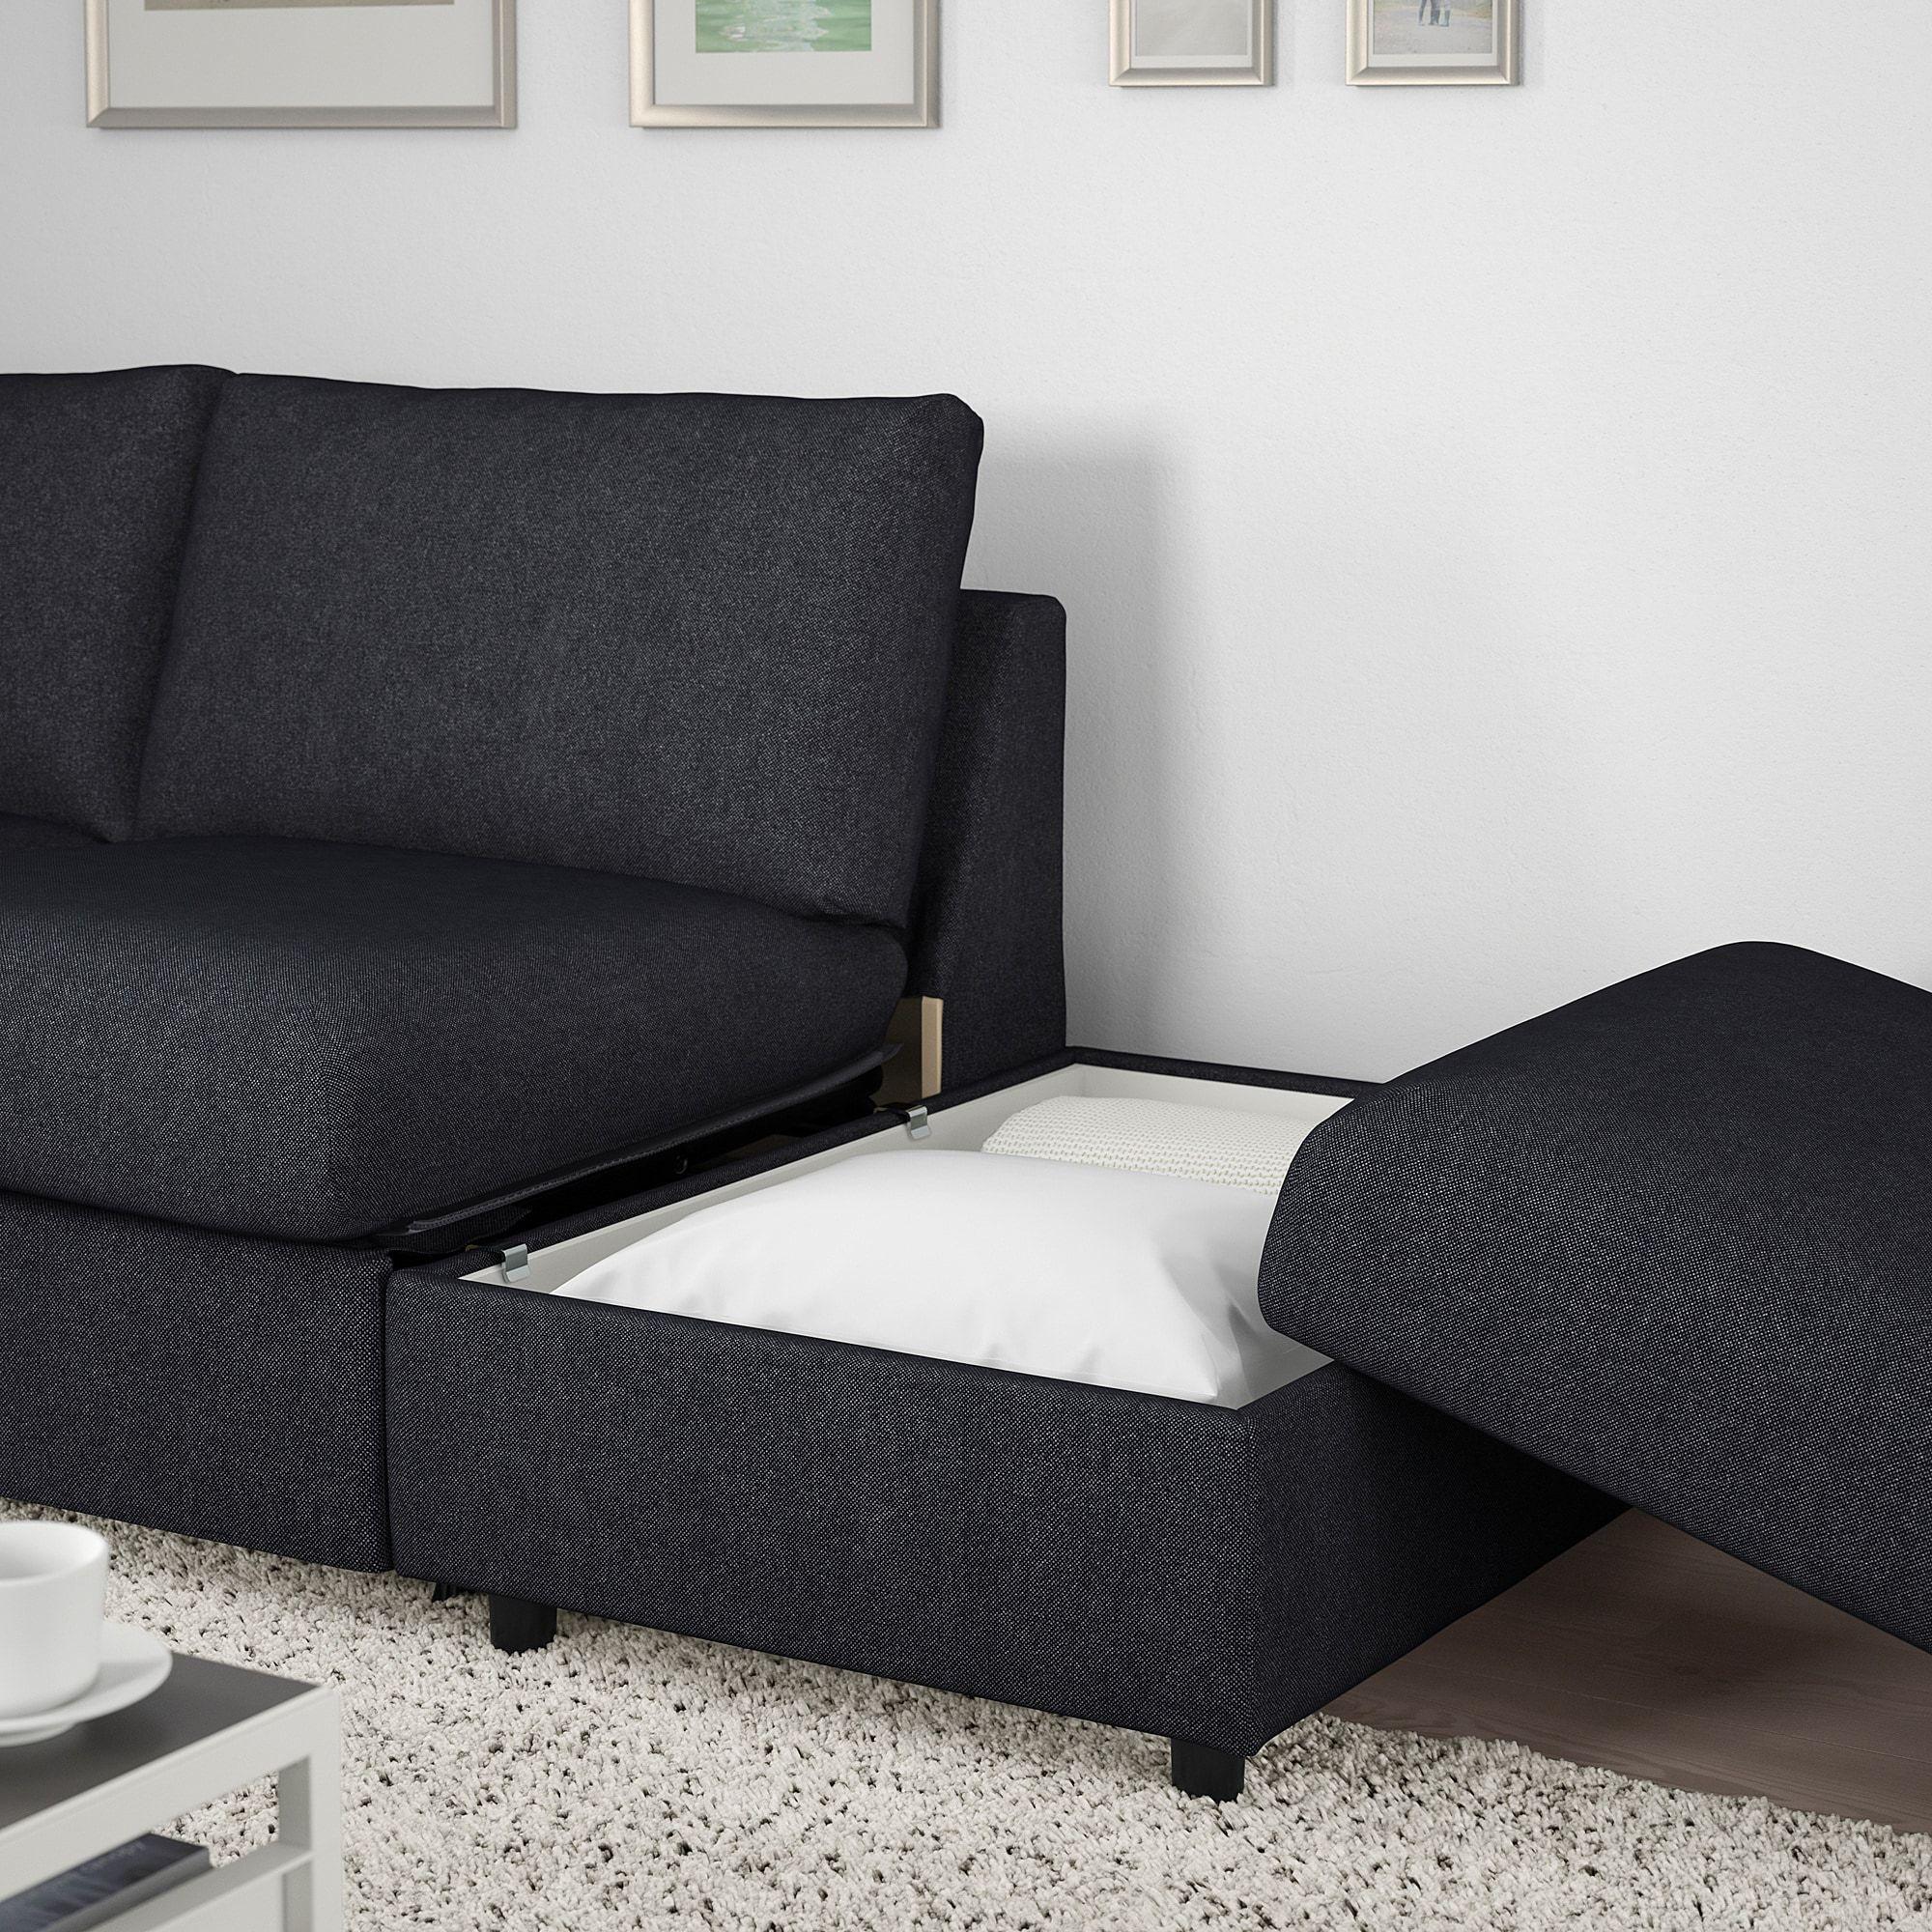 Fauteuil Lit Convertible Alinea 35 unique alinea canape d angle | salon jardin